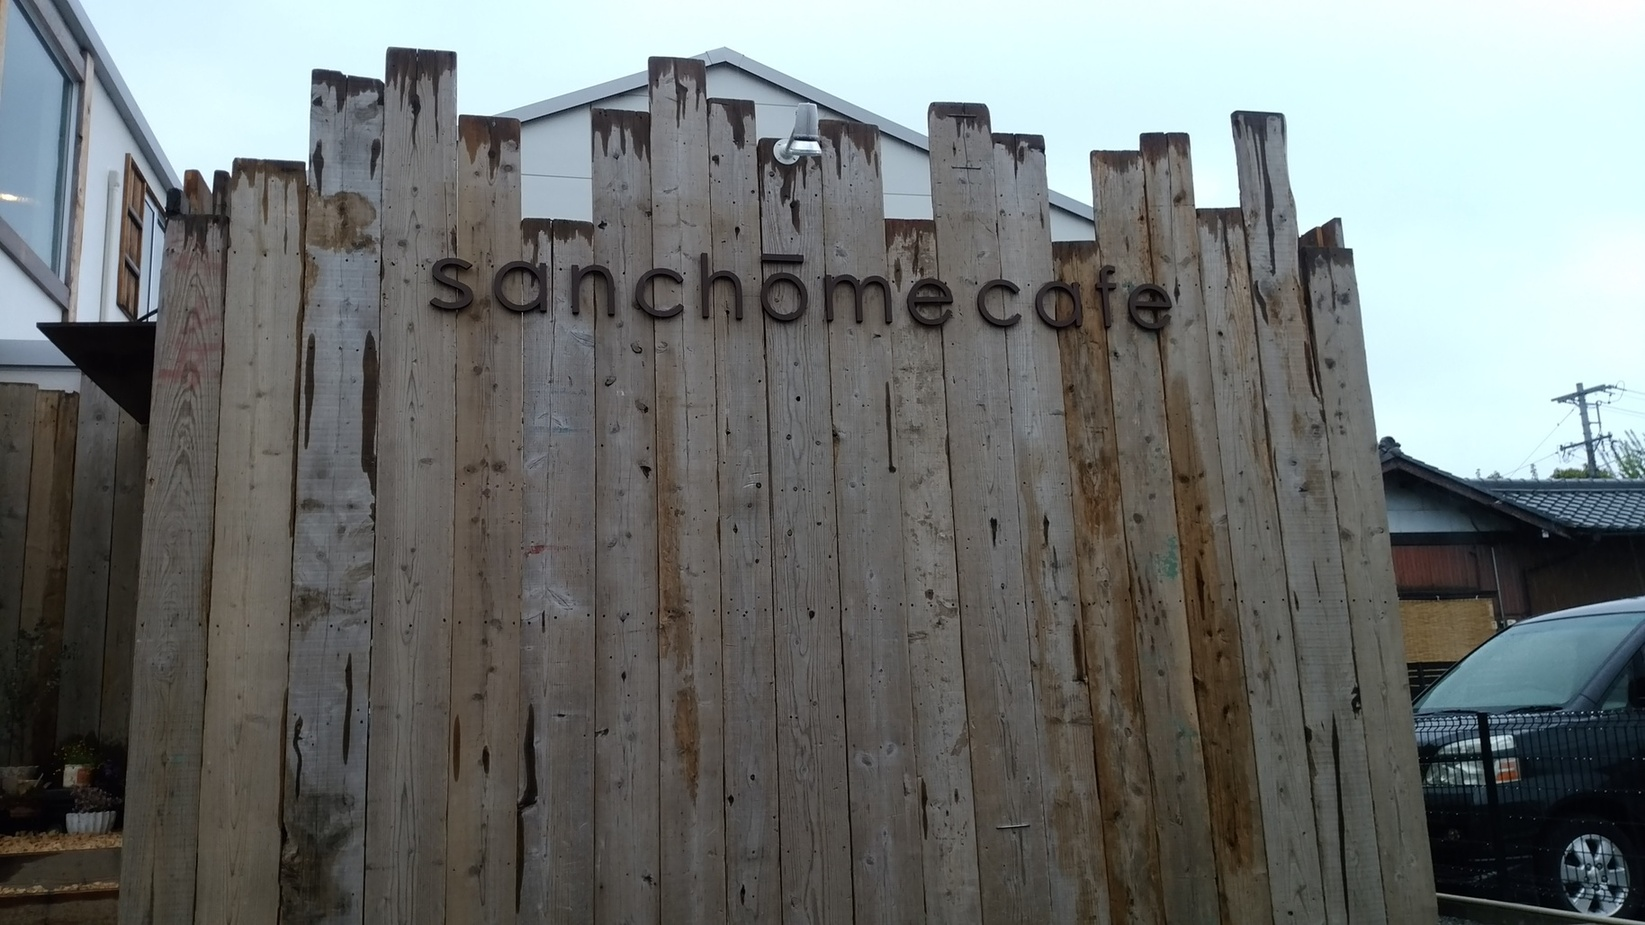 sanchome cafe